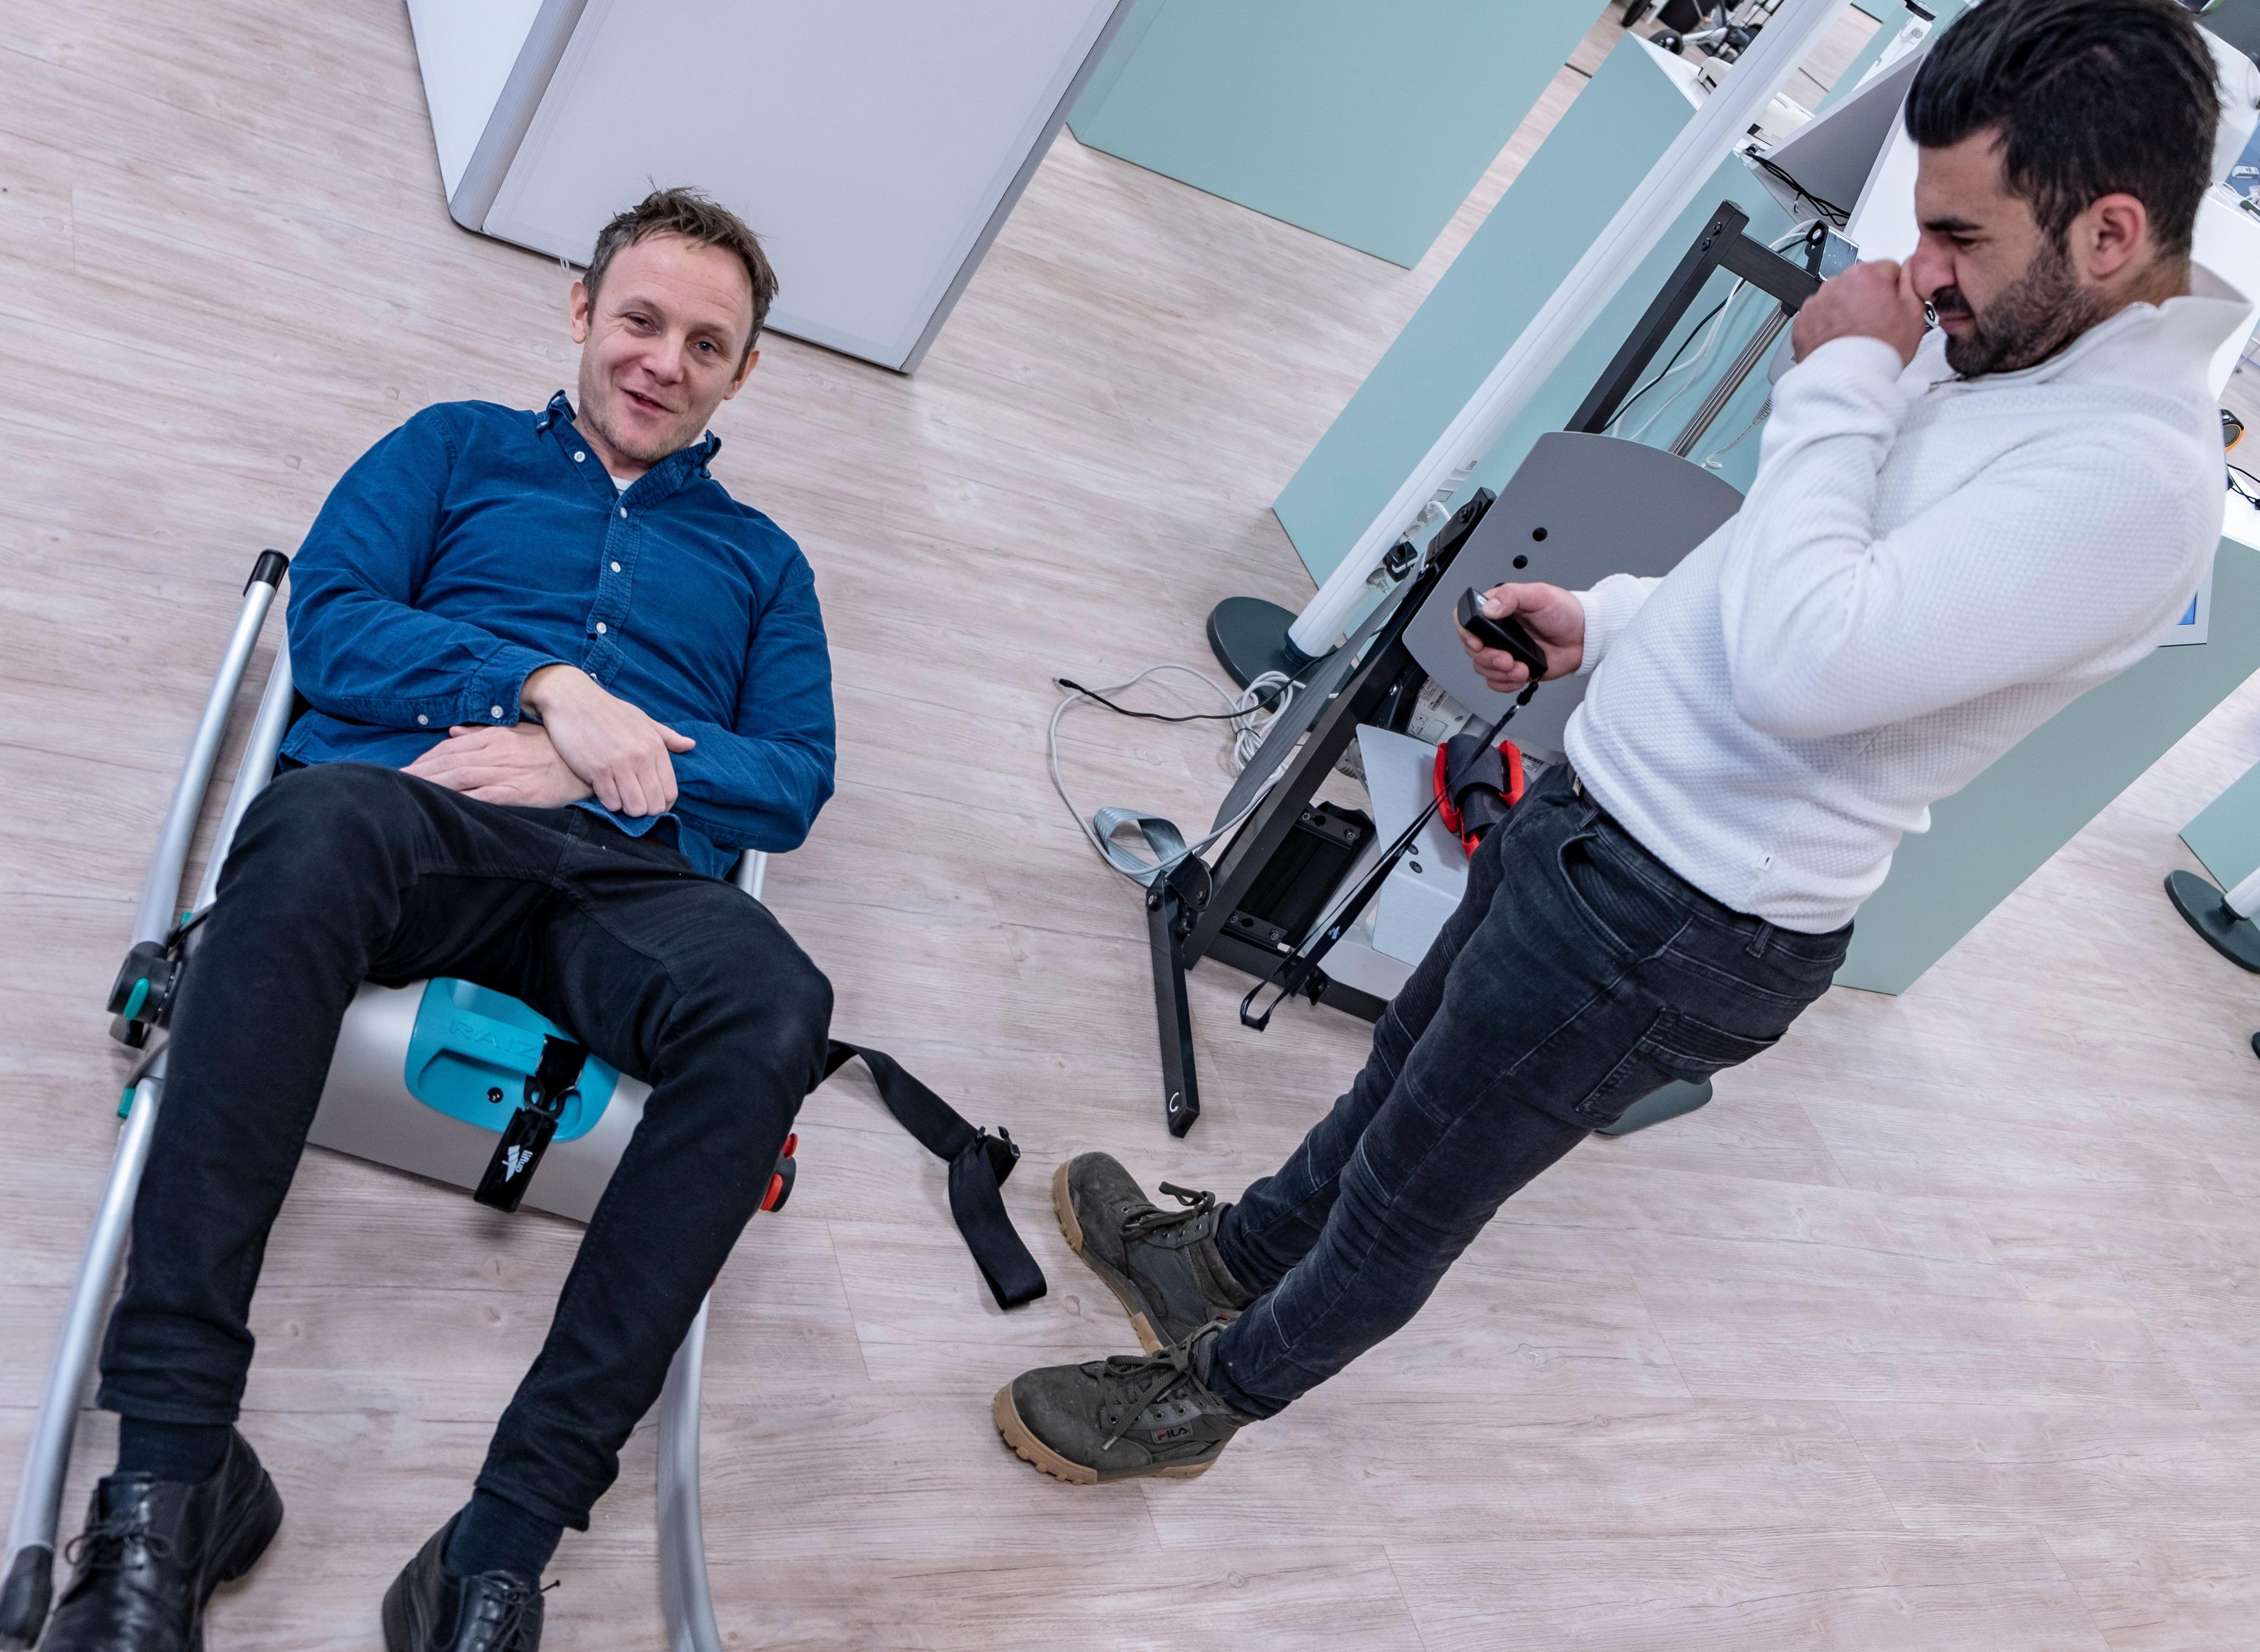 Jeppe Skjønberg og Sahrad Solaimani viser frem ny teknologi på Atri-X.